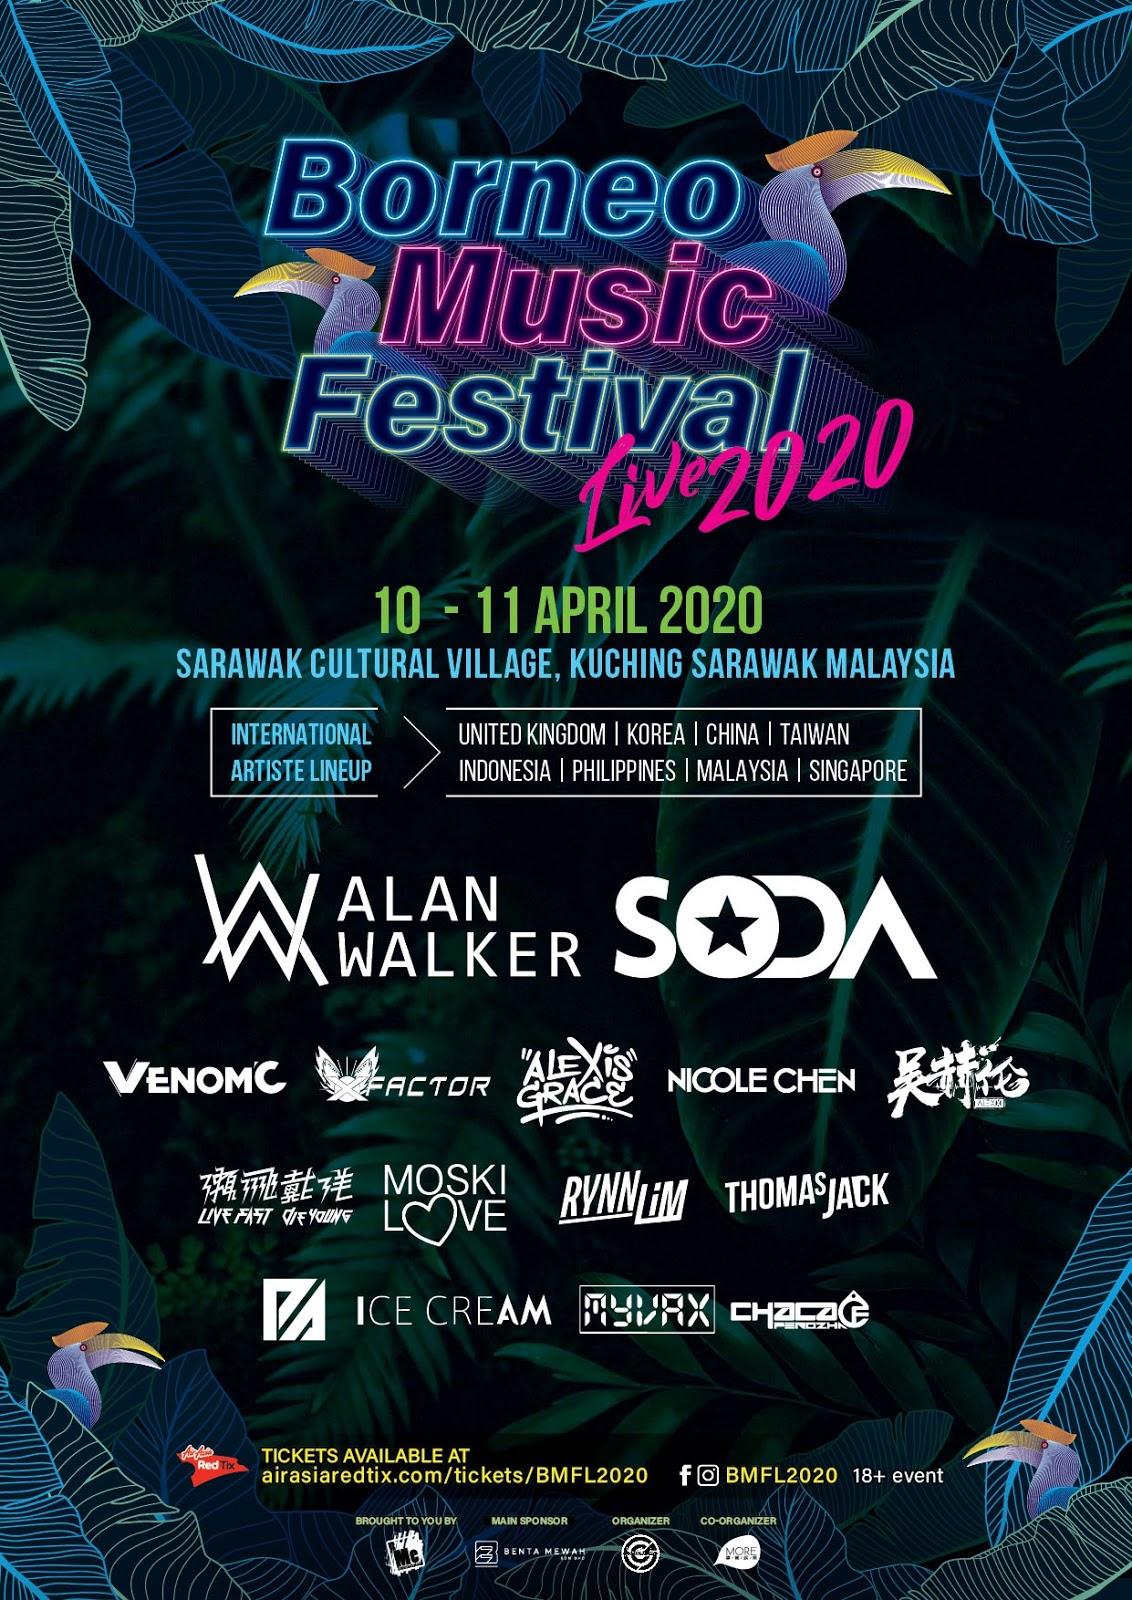 Borneo2BMusic2BFestival2BLive2B20202BPicture